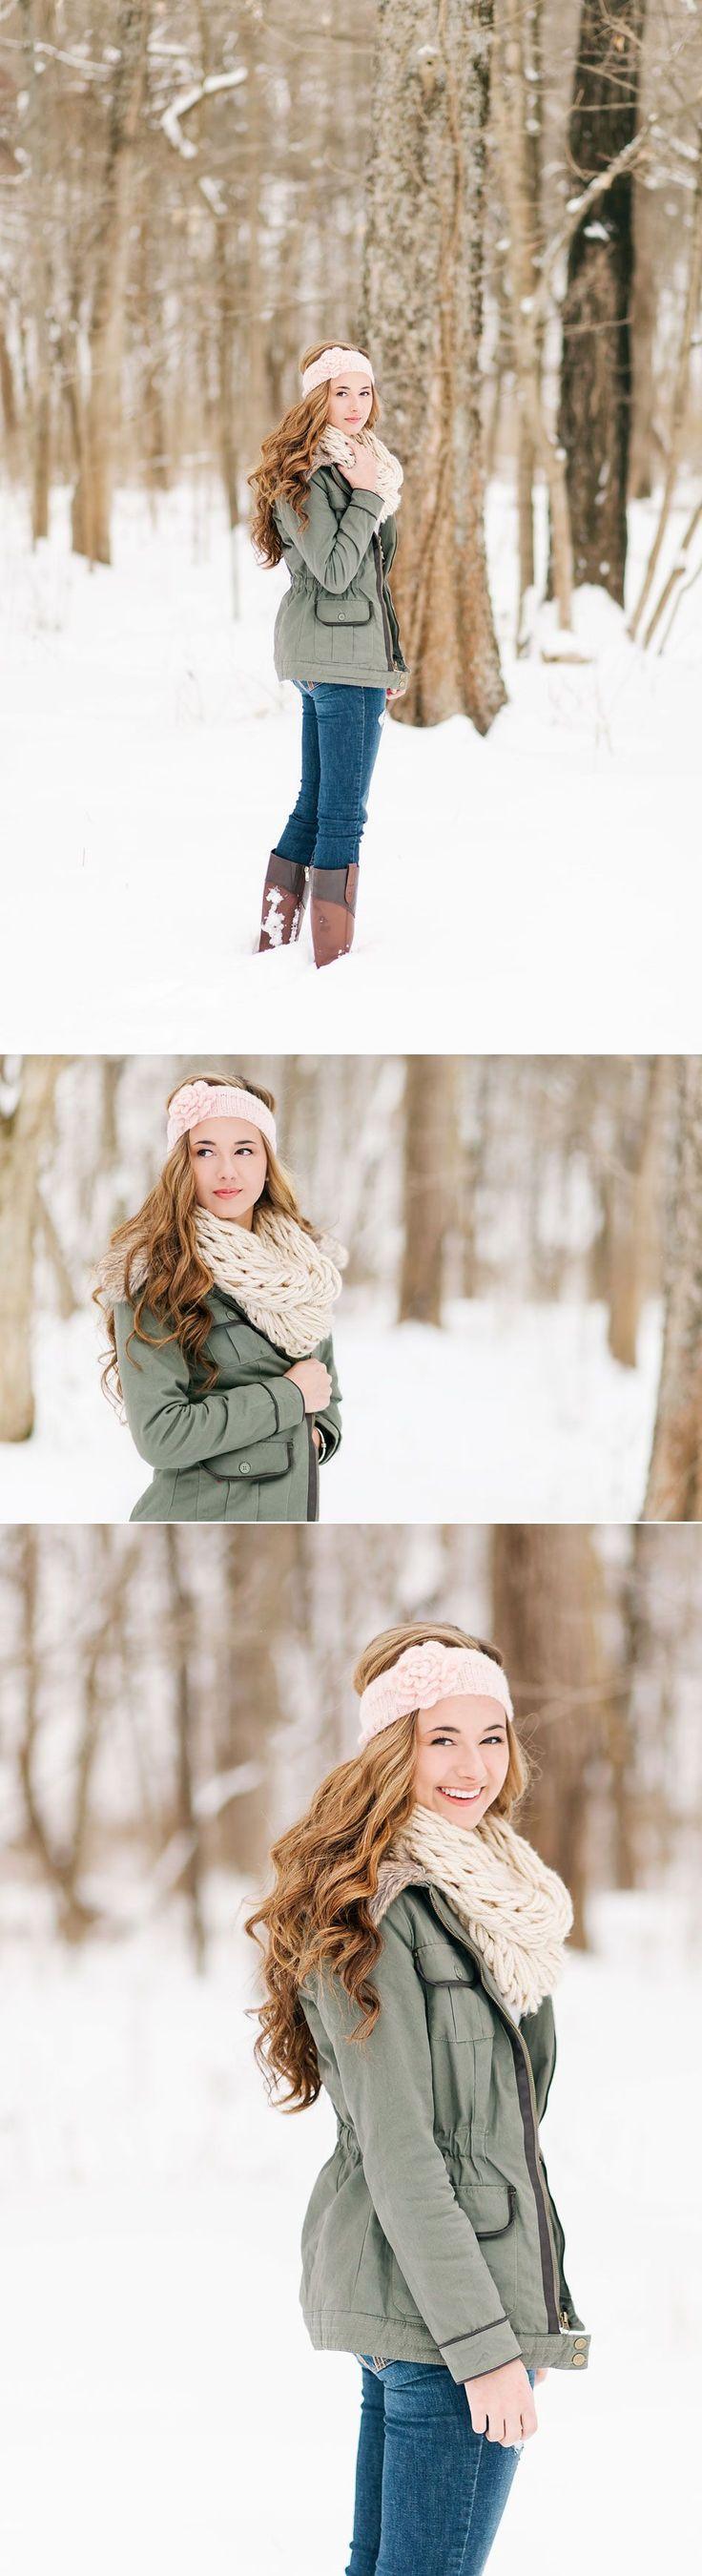 Lux Senior Photography - Snowy Senior Portraits in Bellbrook, Ohio #seniorphotography,